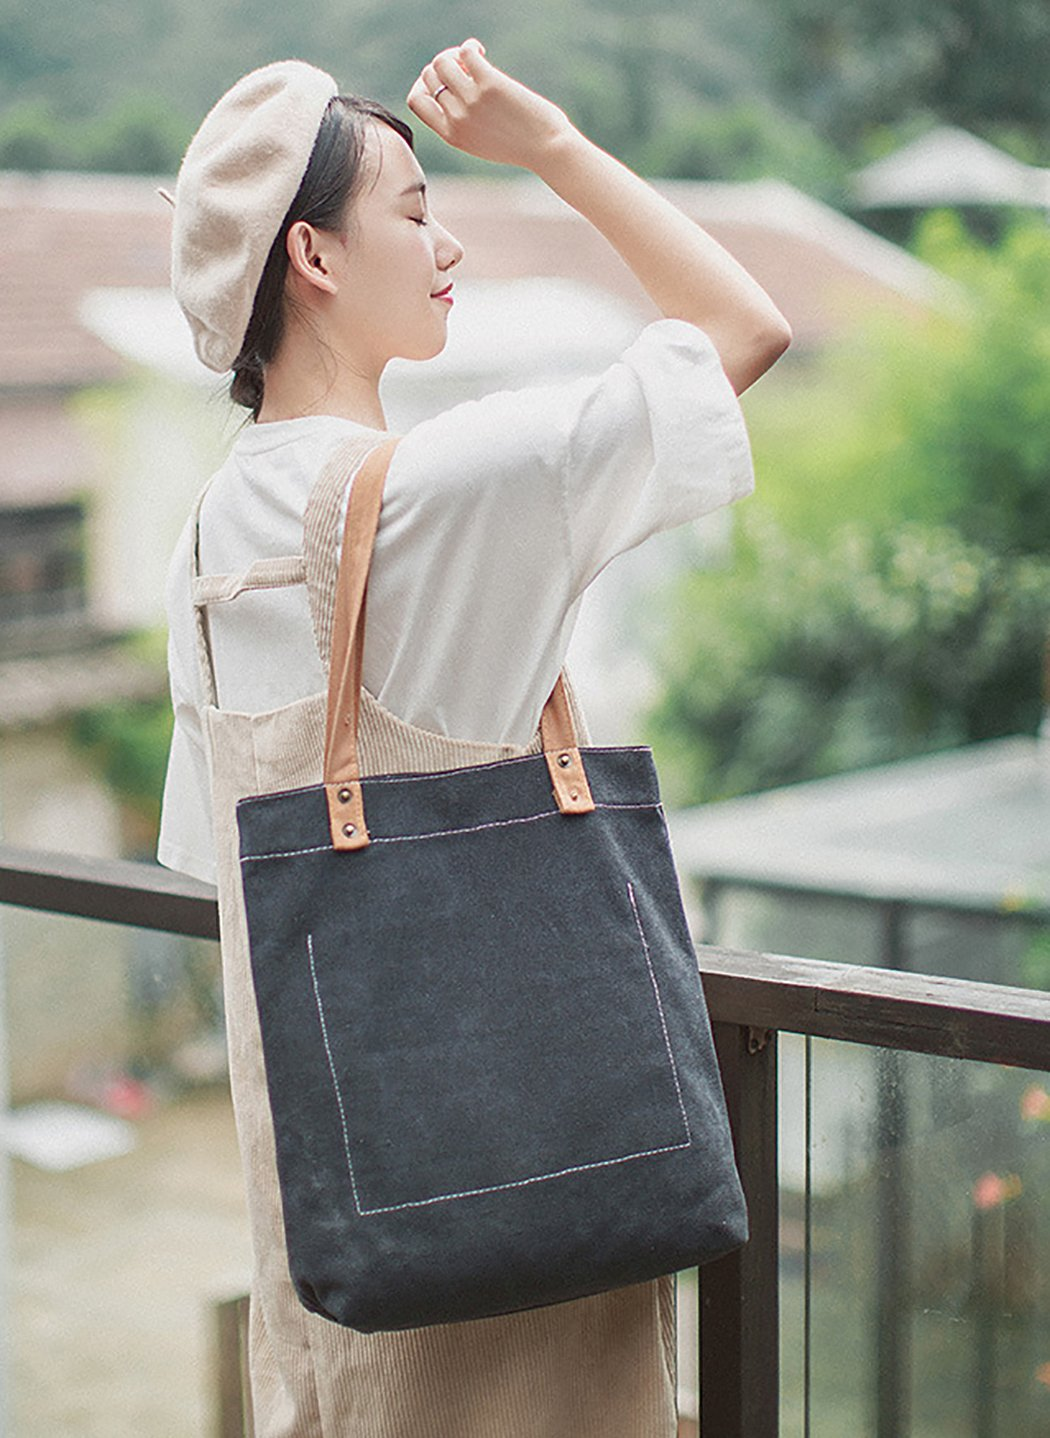 Bageek Canvas Tote Bag Handbags for Womens Bag Canvas Purses and Handbags by Bageek (Image #5)